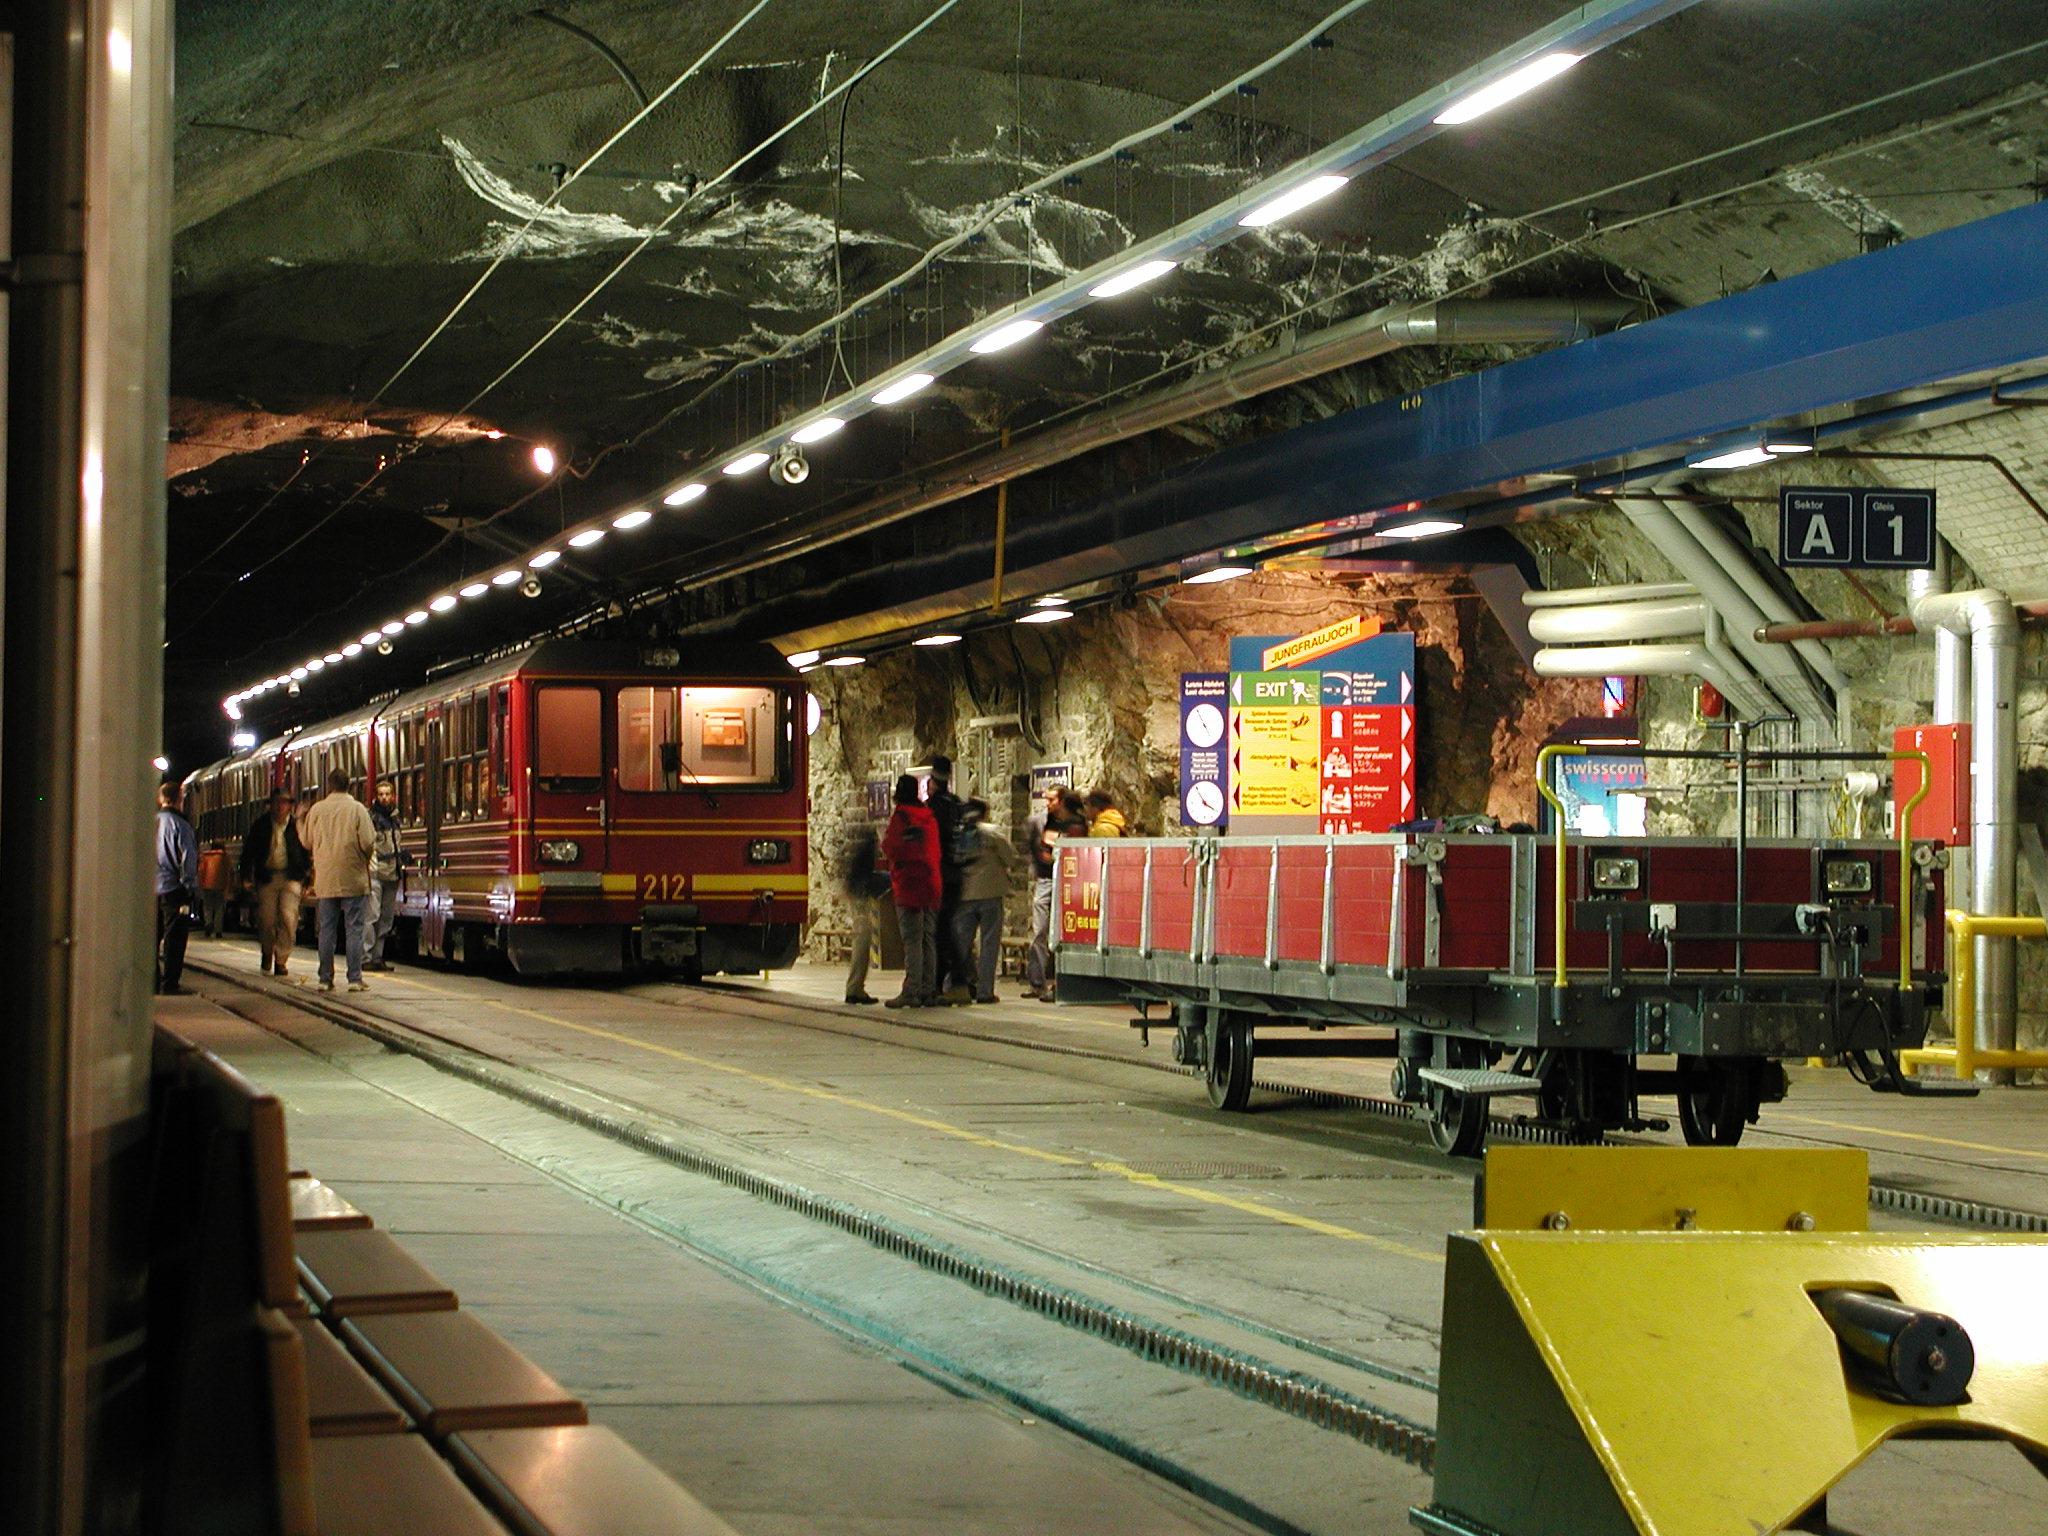 Estação da Jungfrau Railway - (Foto: Wikimedia Commons)